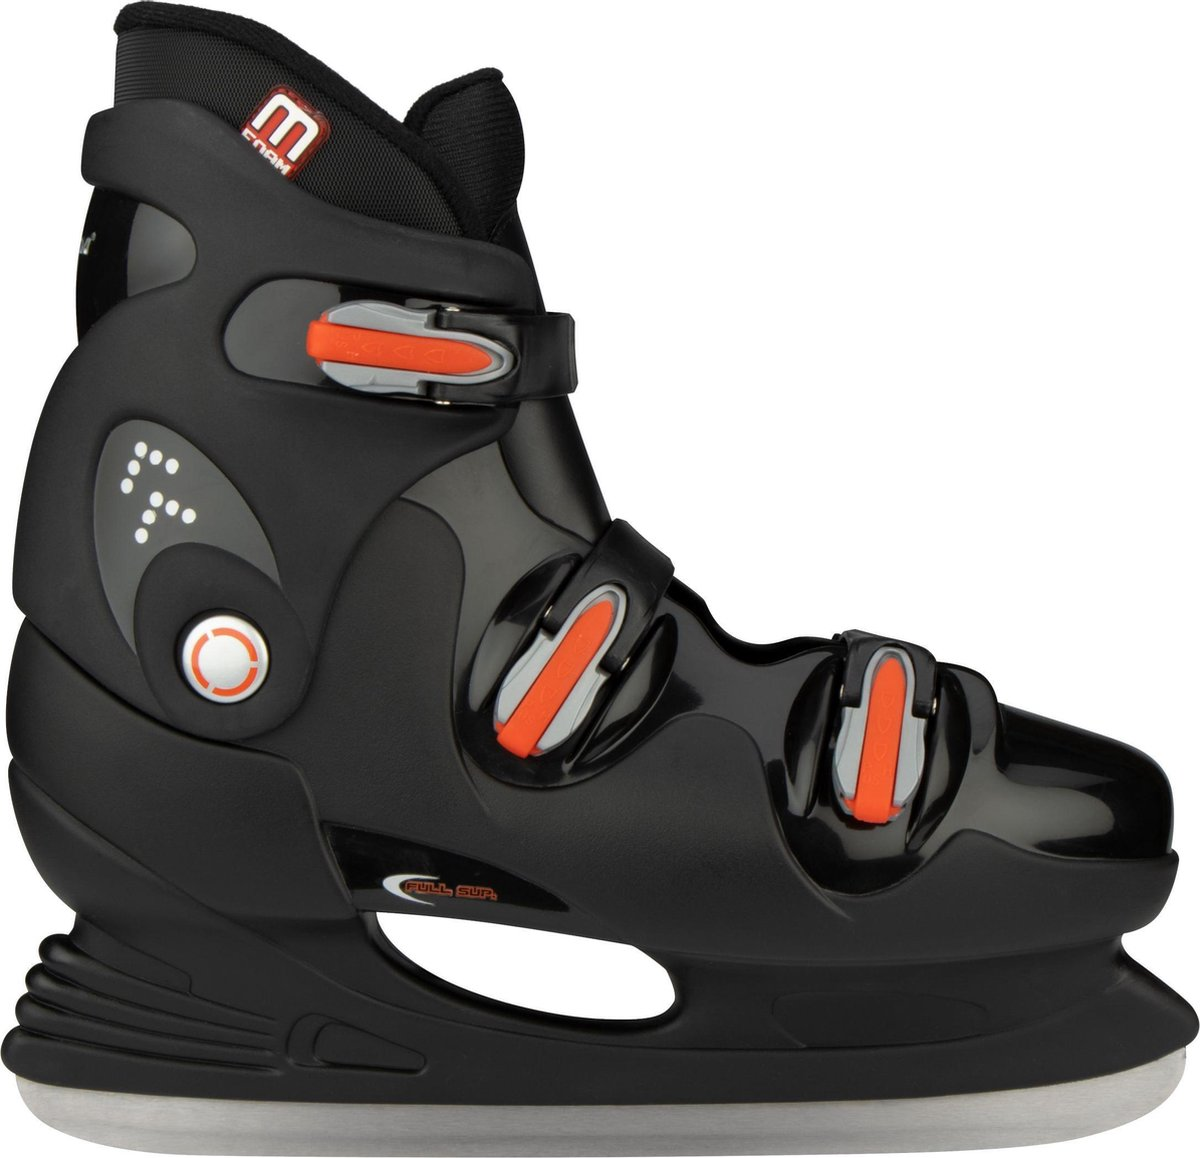 Nijdam IJshockeyschaats - Hardboot - Zwart/Zilver/Rood - 42